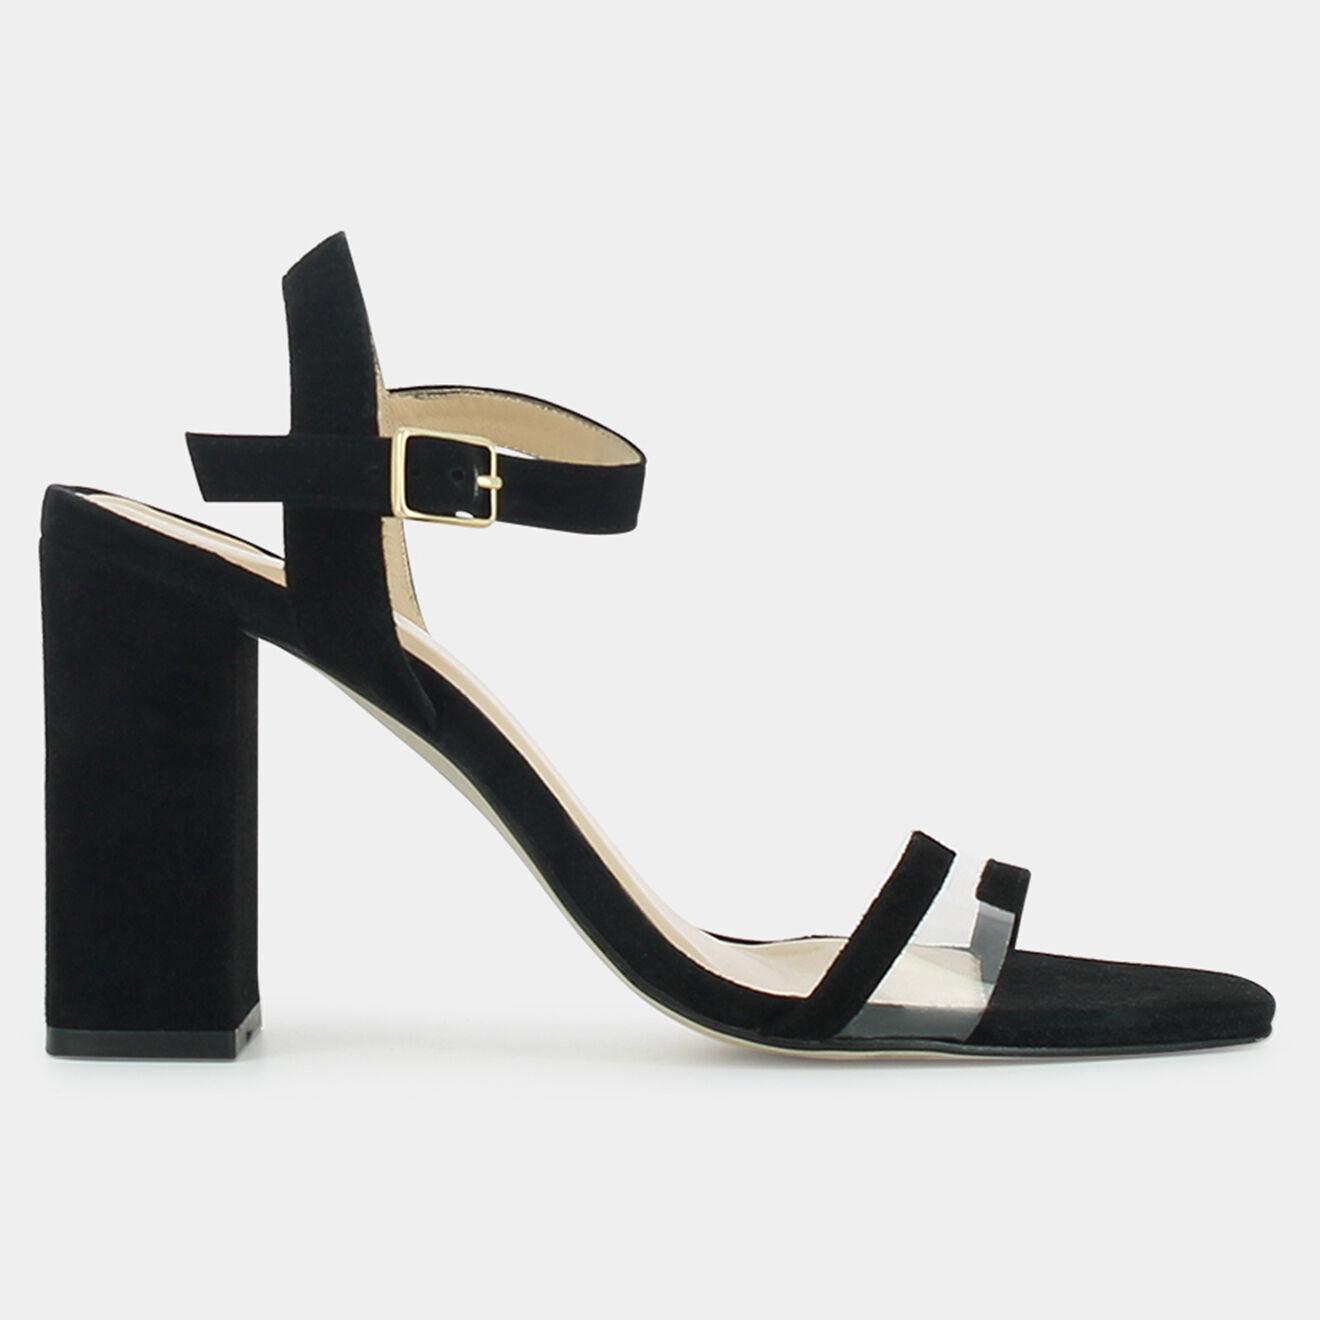 Sandales en Velours de Cuir Vitamie noires - Talon 8.5 cm - Jonak - Modalova